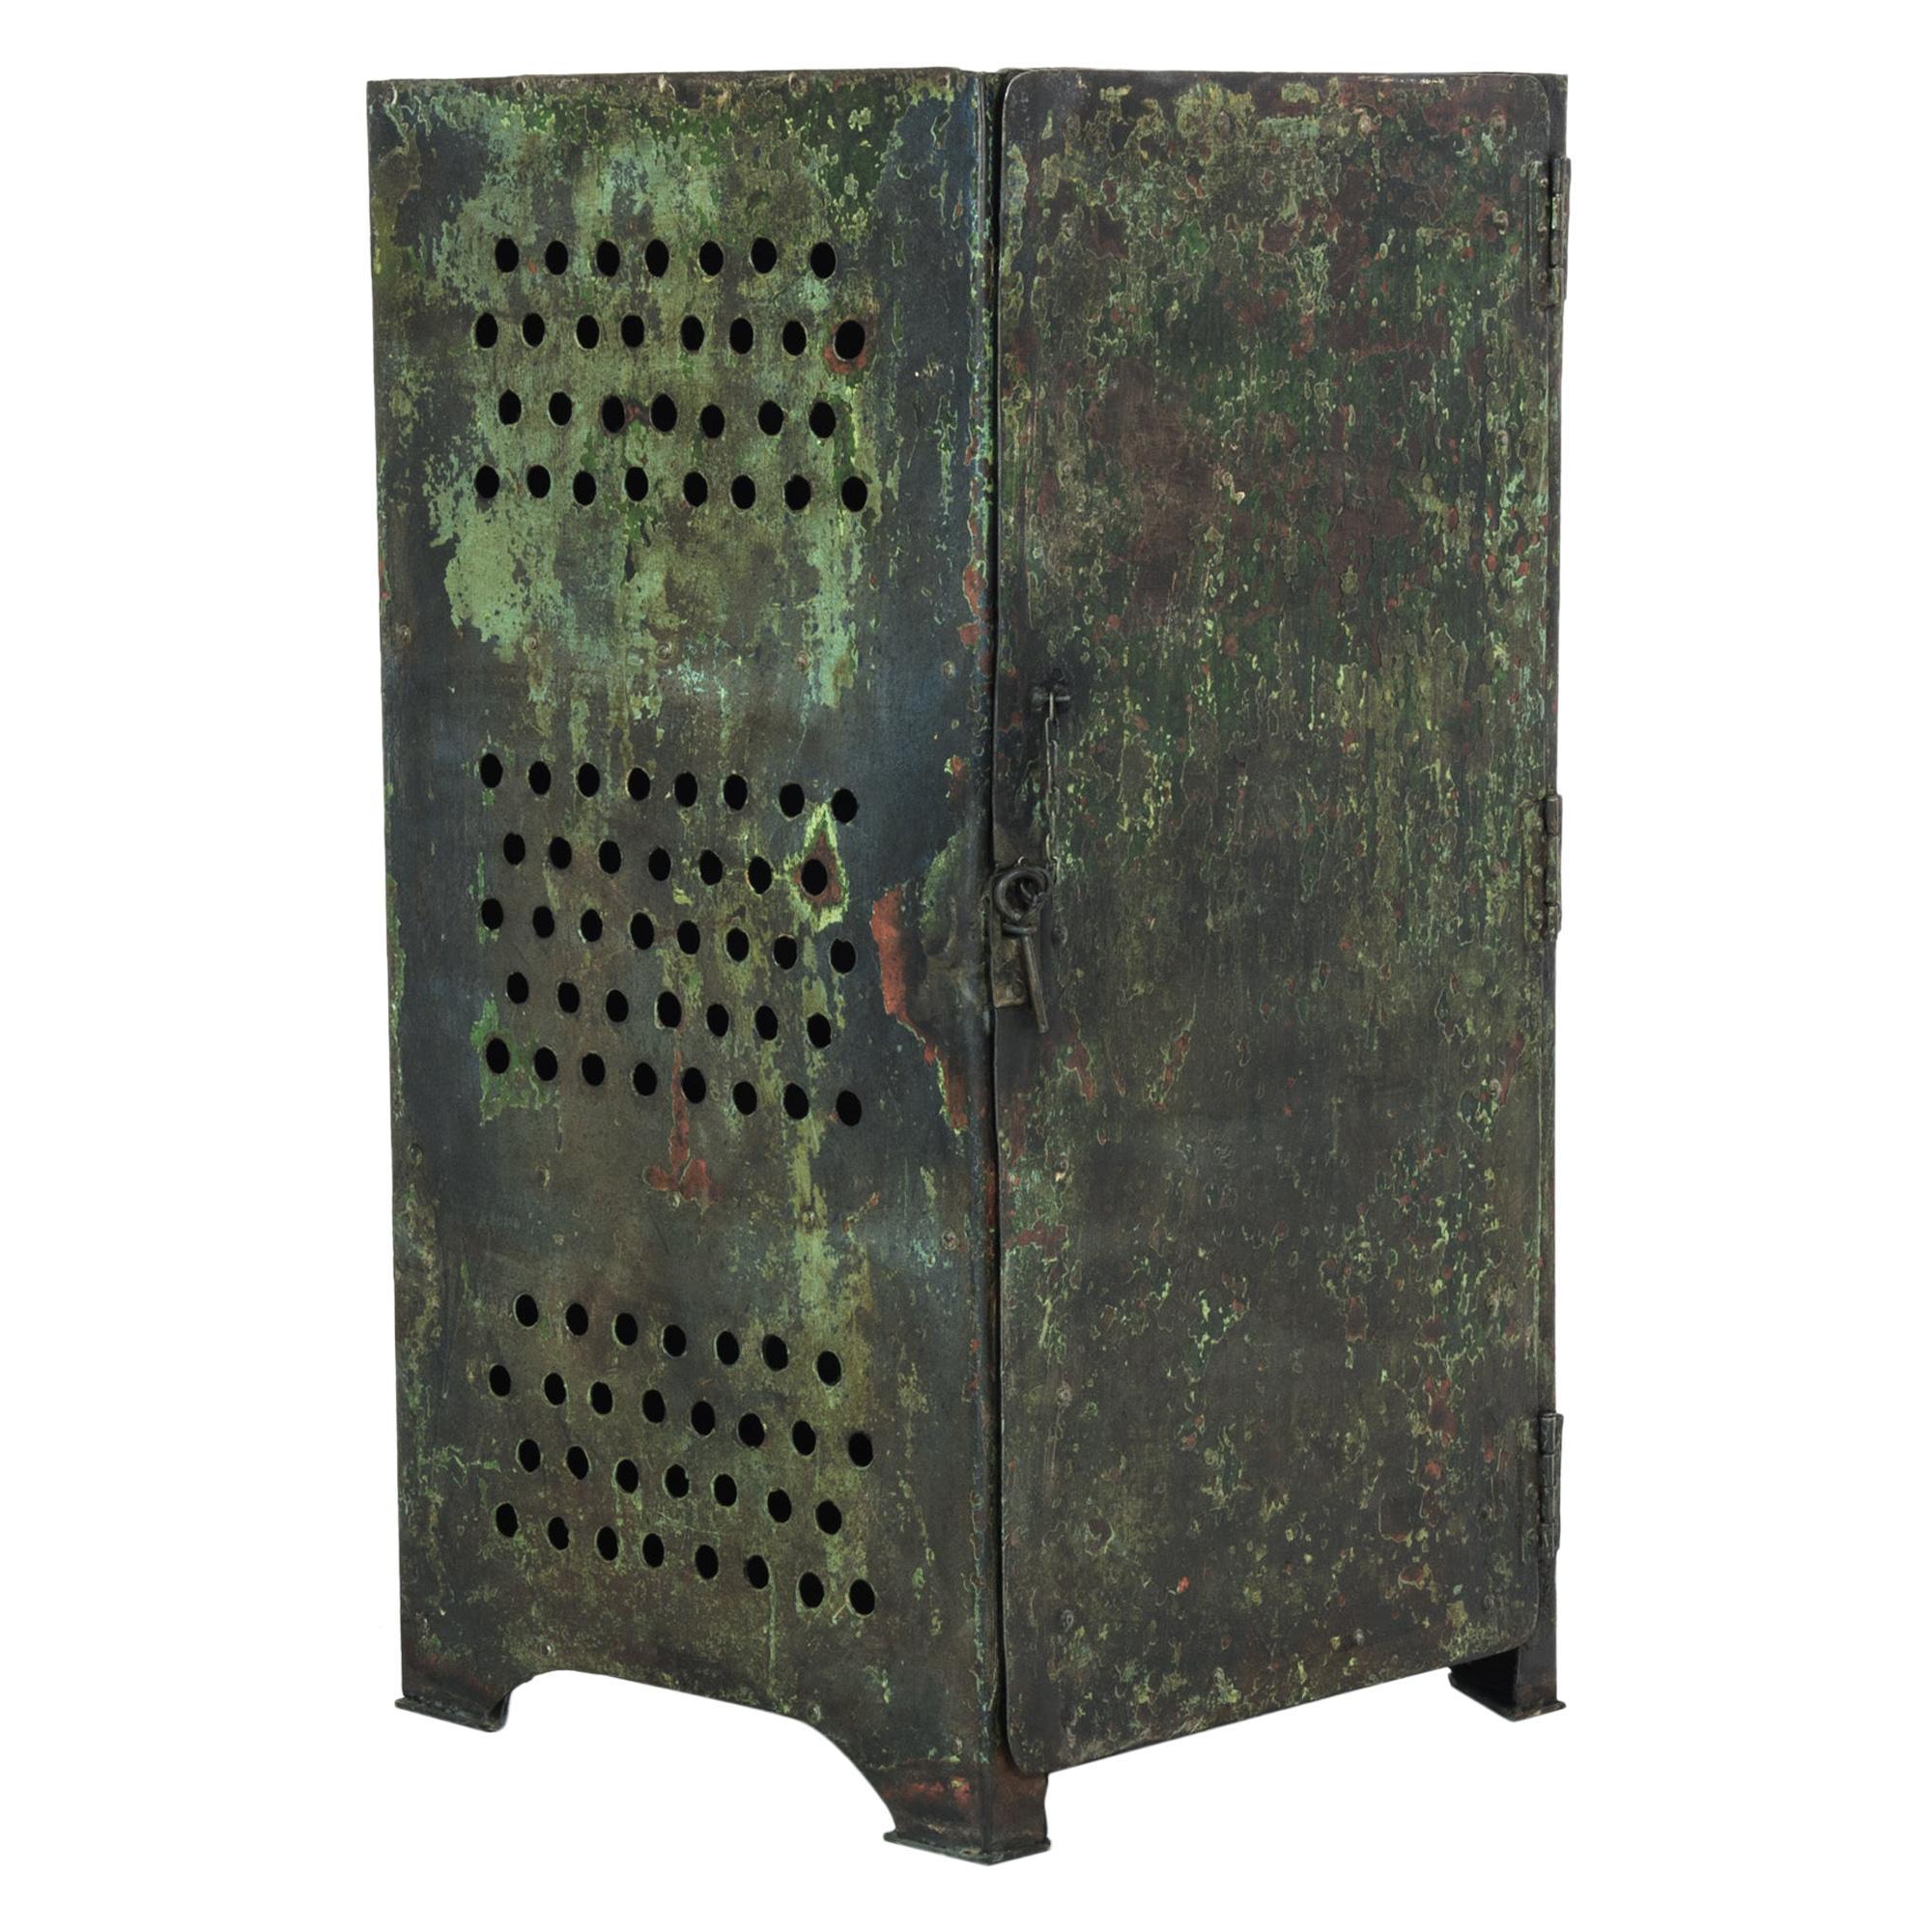 1910s French Industrial Metal Locker